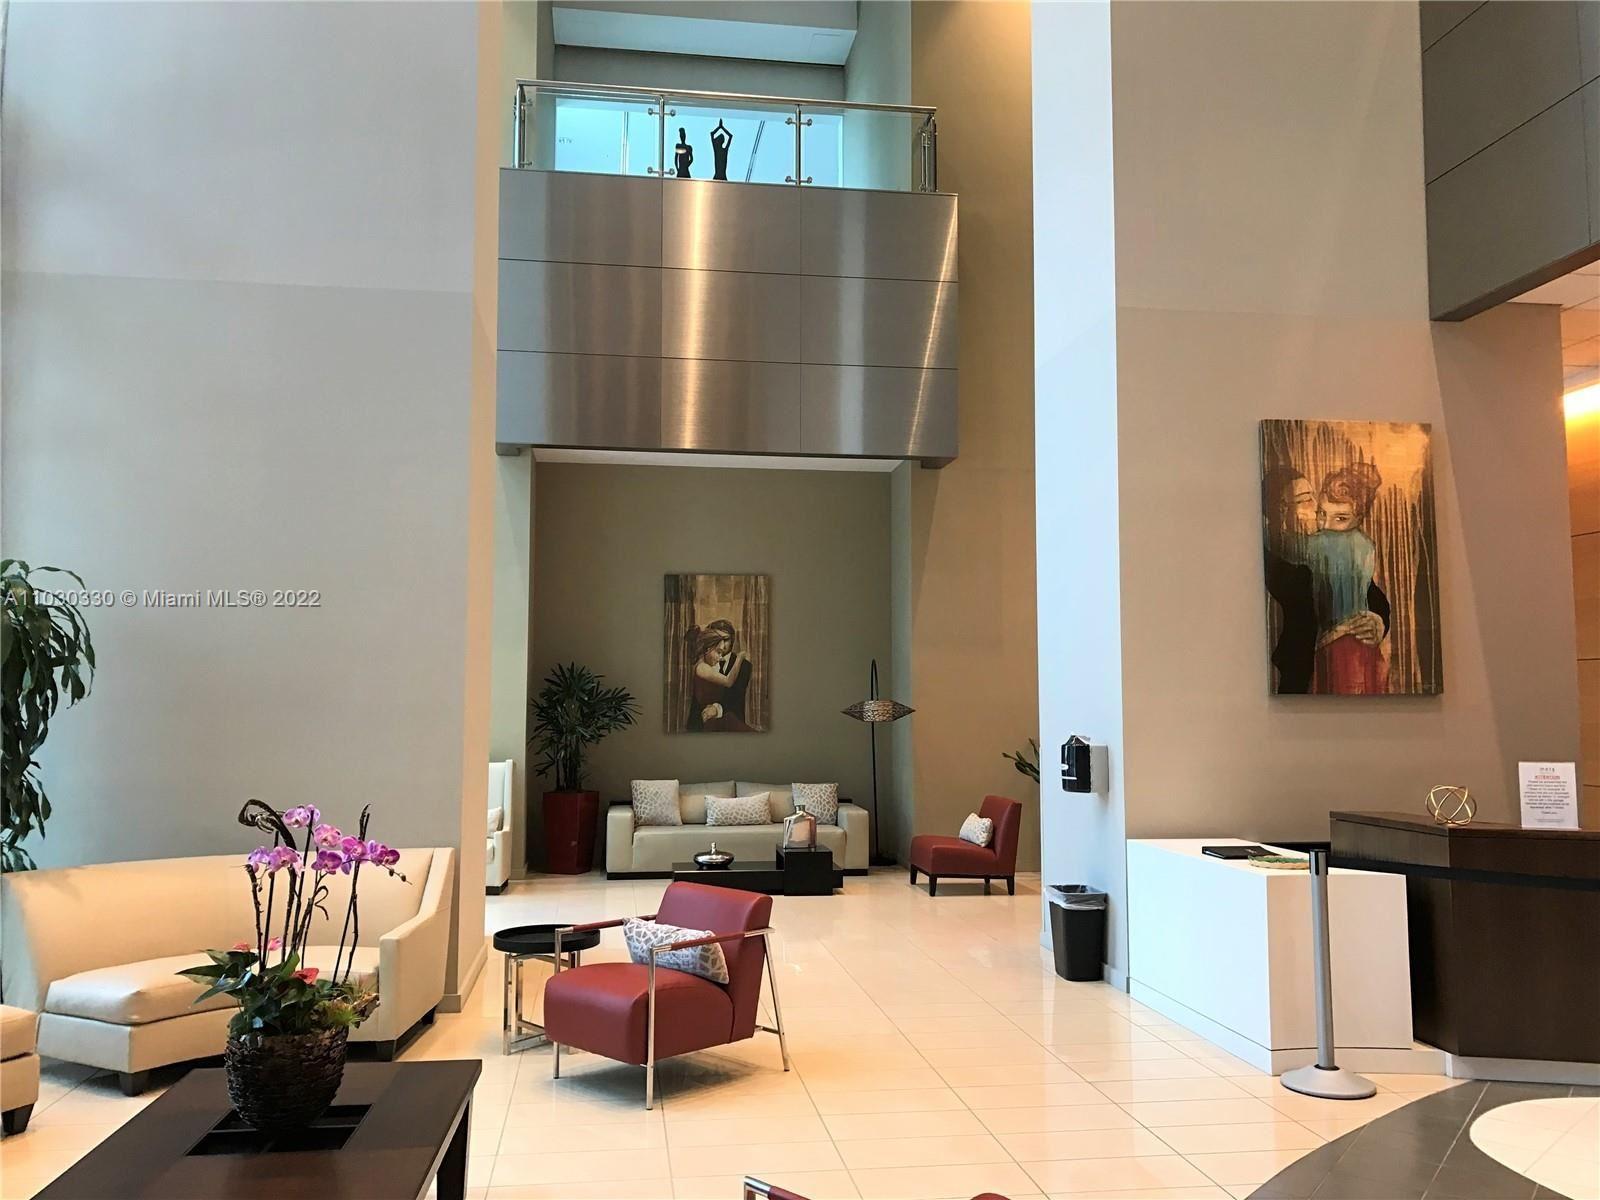 300 S Biscayne Blvd #L-1202, Miami, FL 33131 - #: A11030330